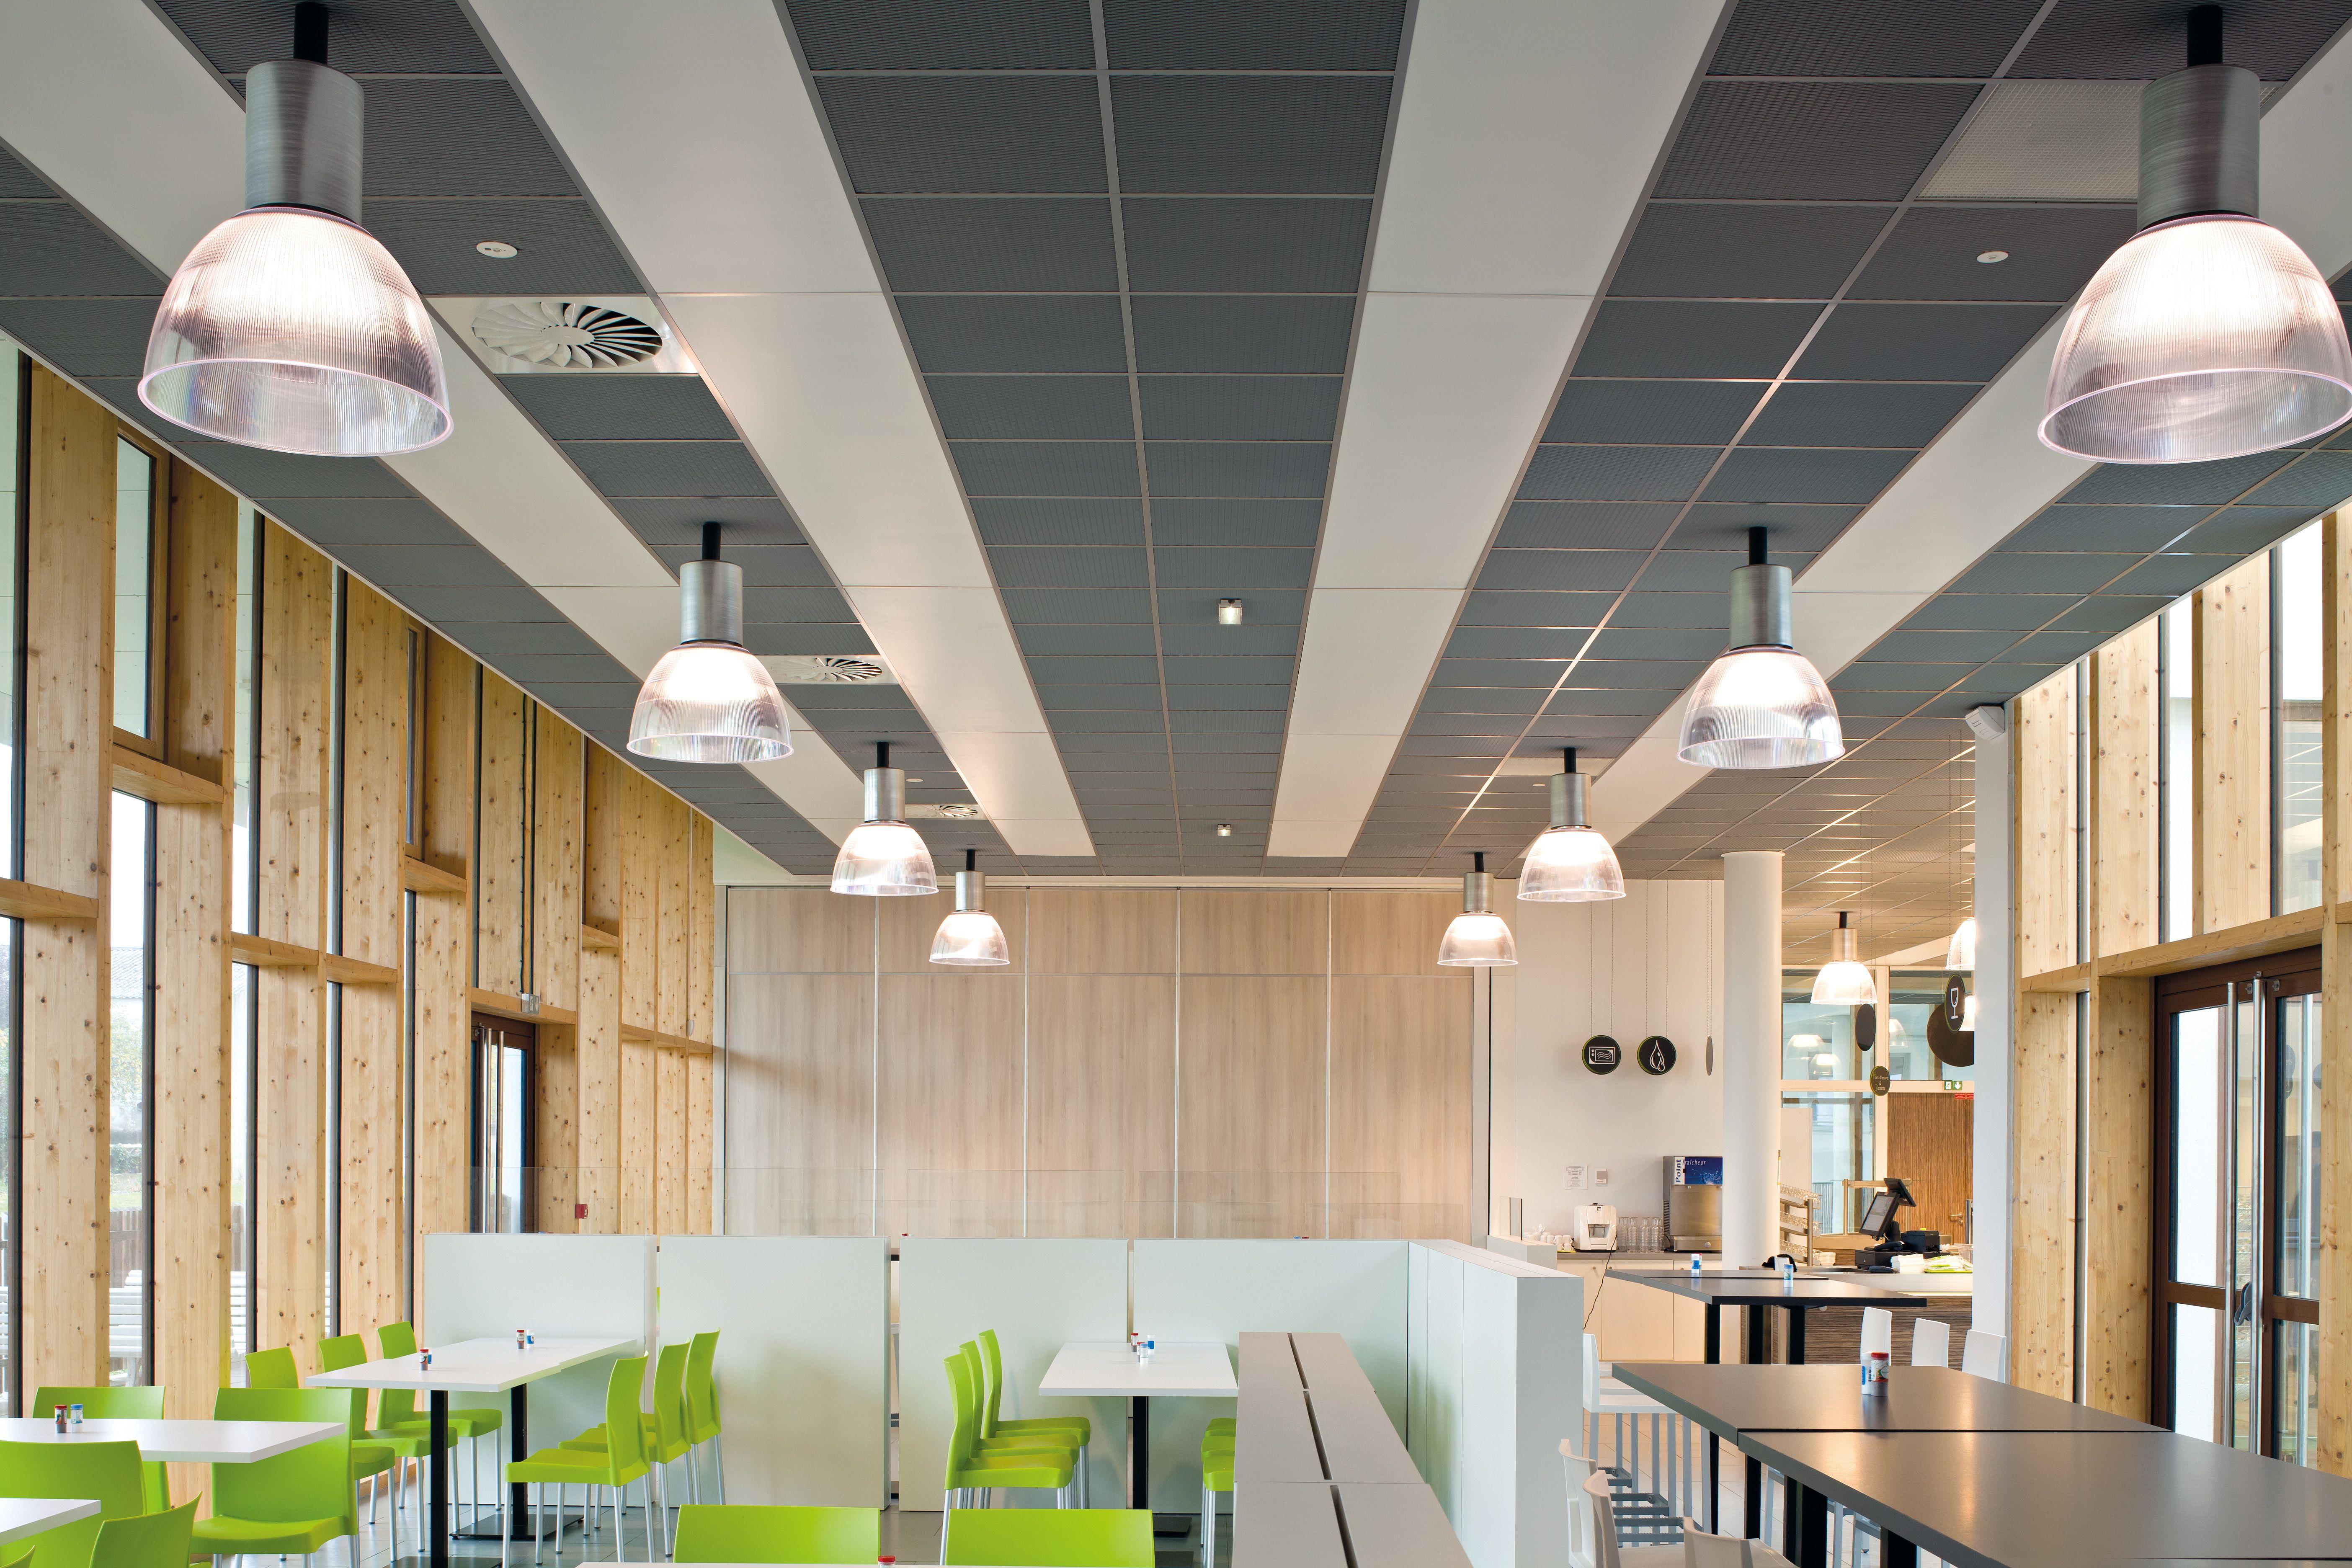 LE PONANT TRAINING CENTER Francja Armstrong Sufity Podwieszane Ceiling Sufit Akustyczny